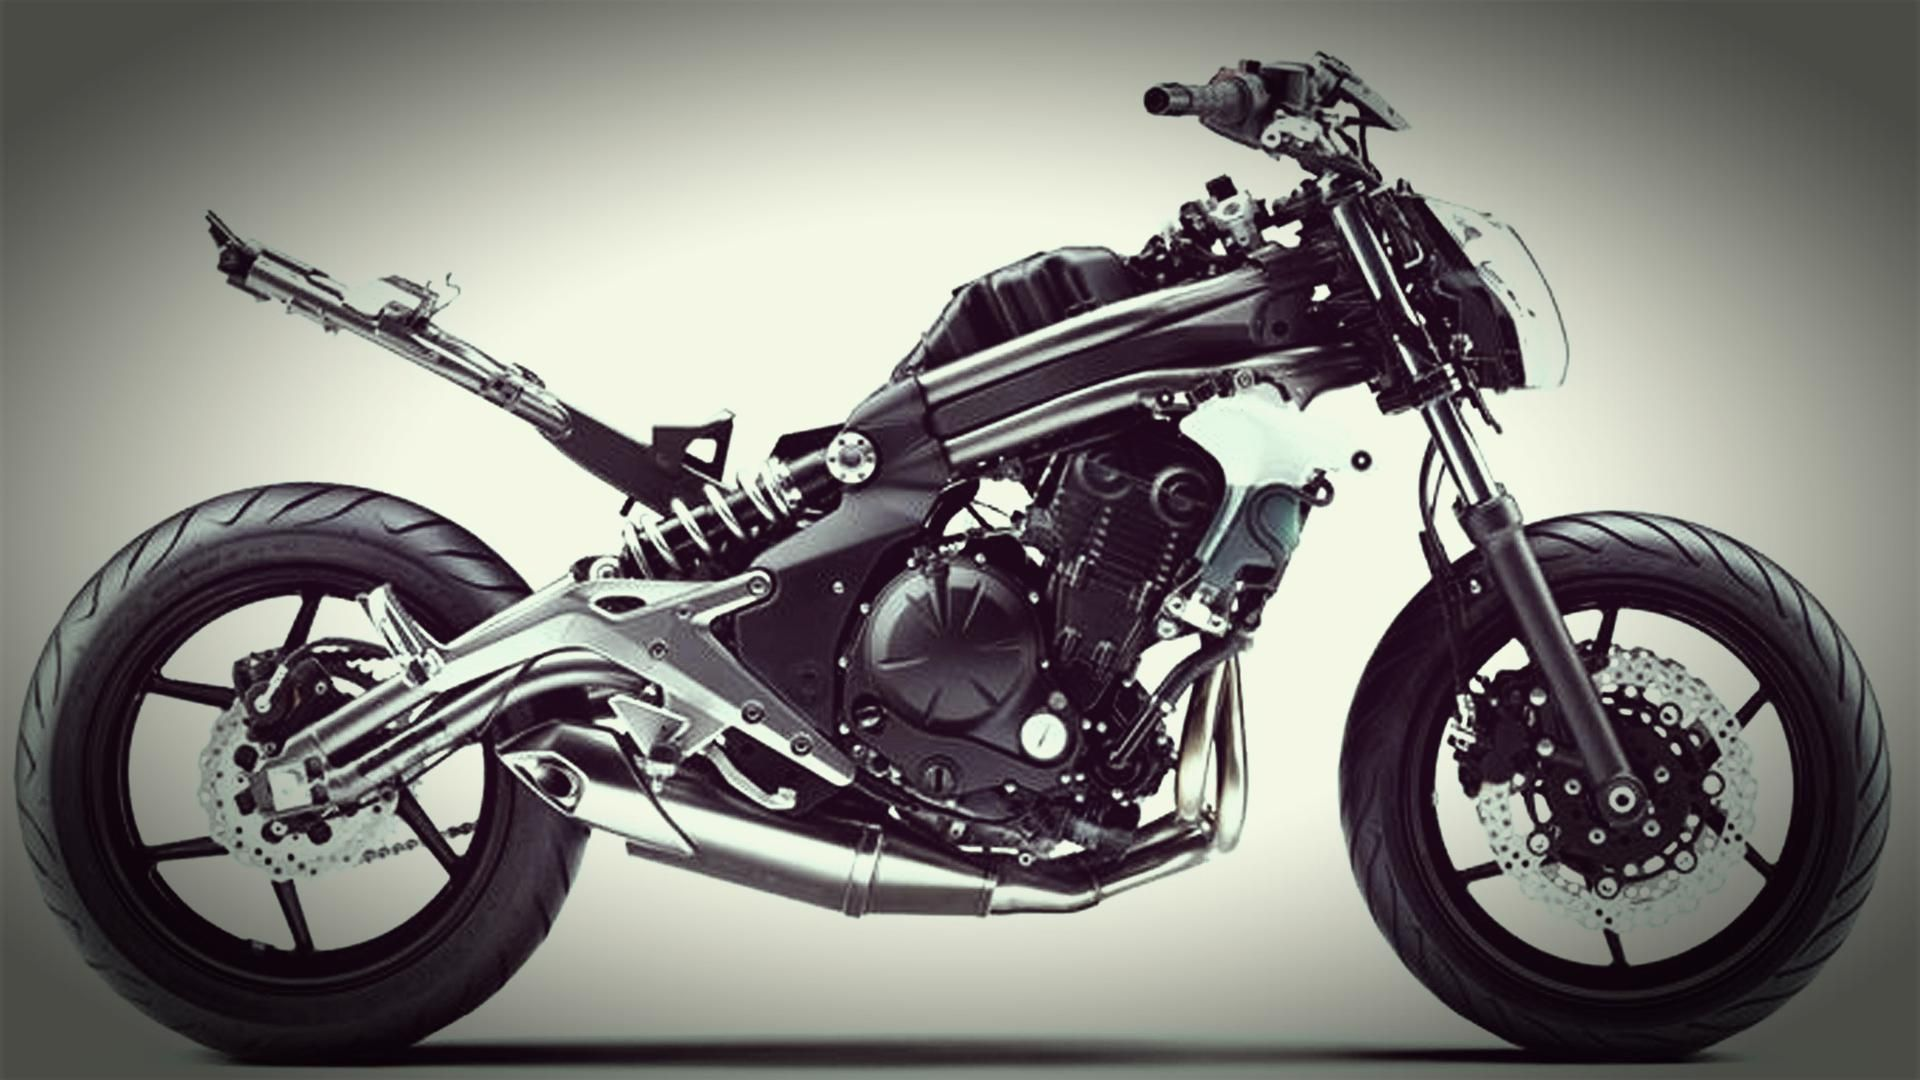 2014 Kawasaki Er 6n Frame Design 2014 Kawasaki Er 6n Abs Features